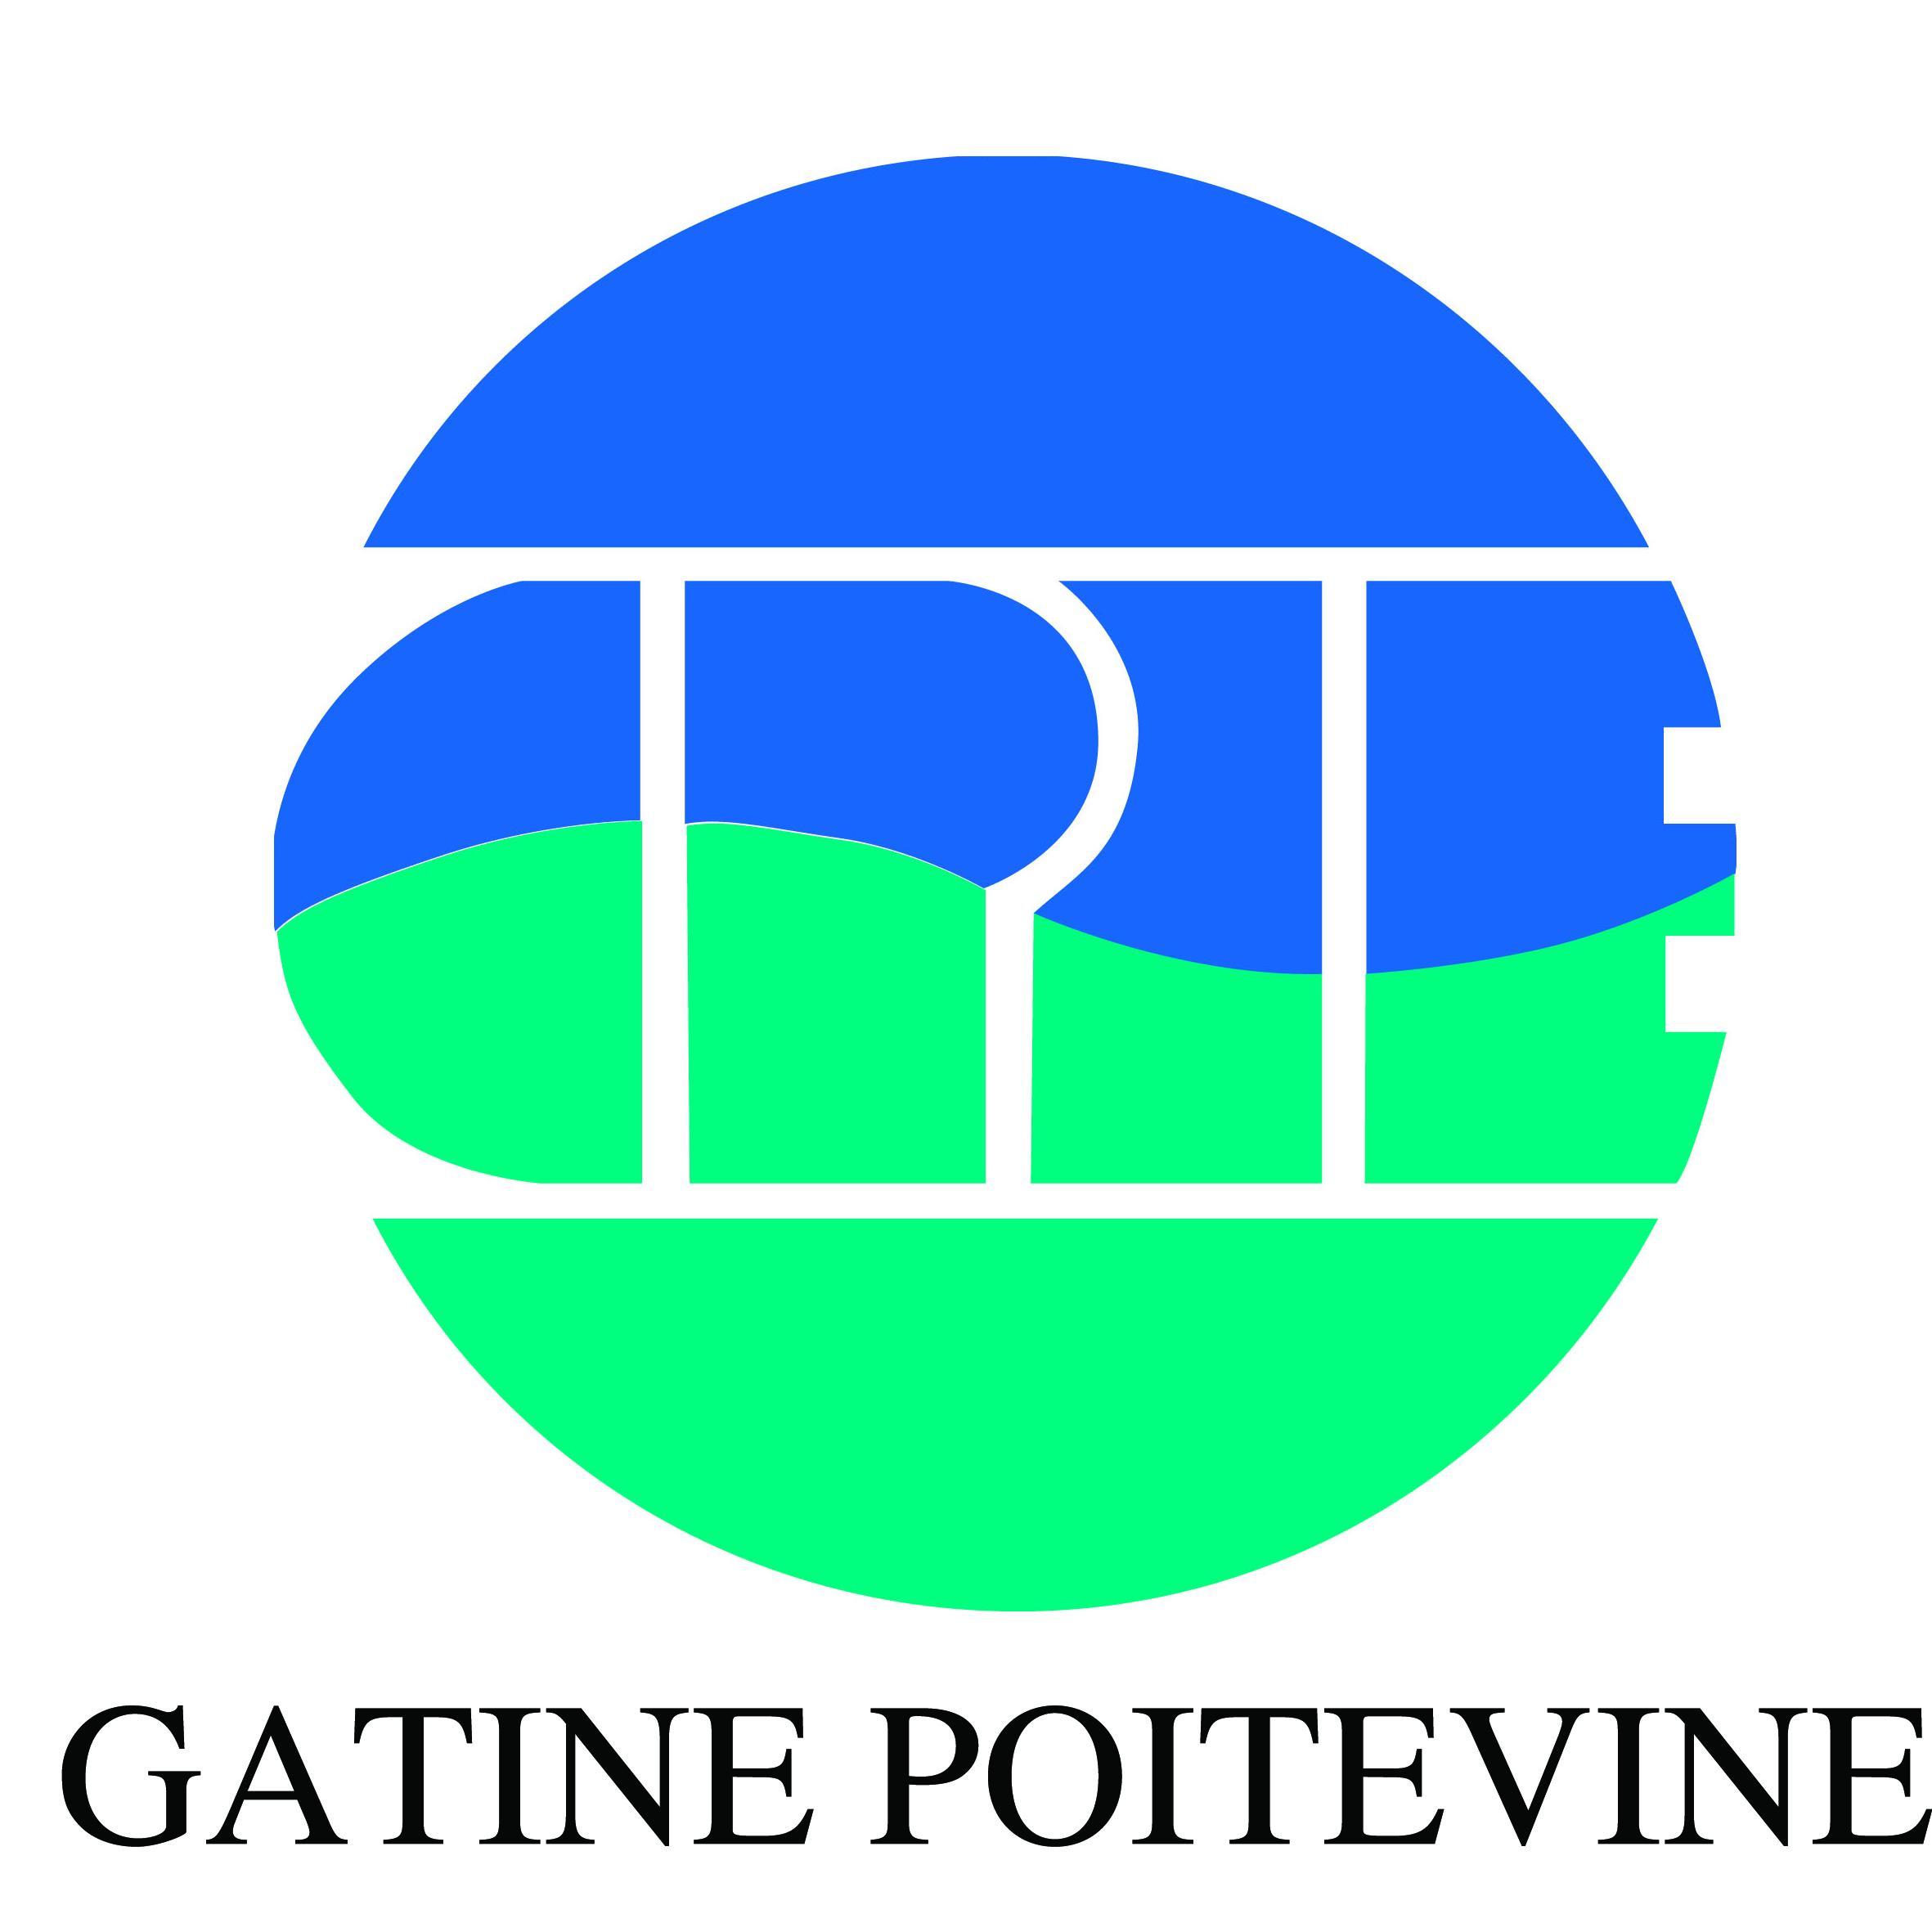 CPIE de Gatine Poitevine logo